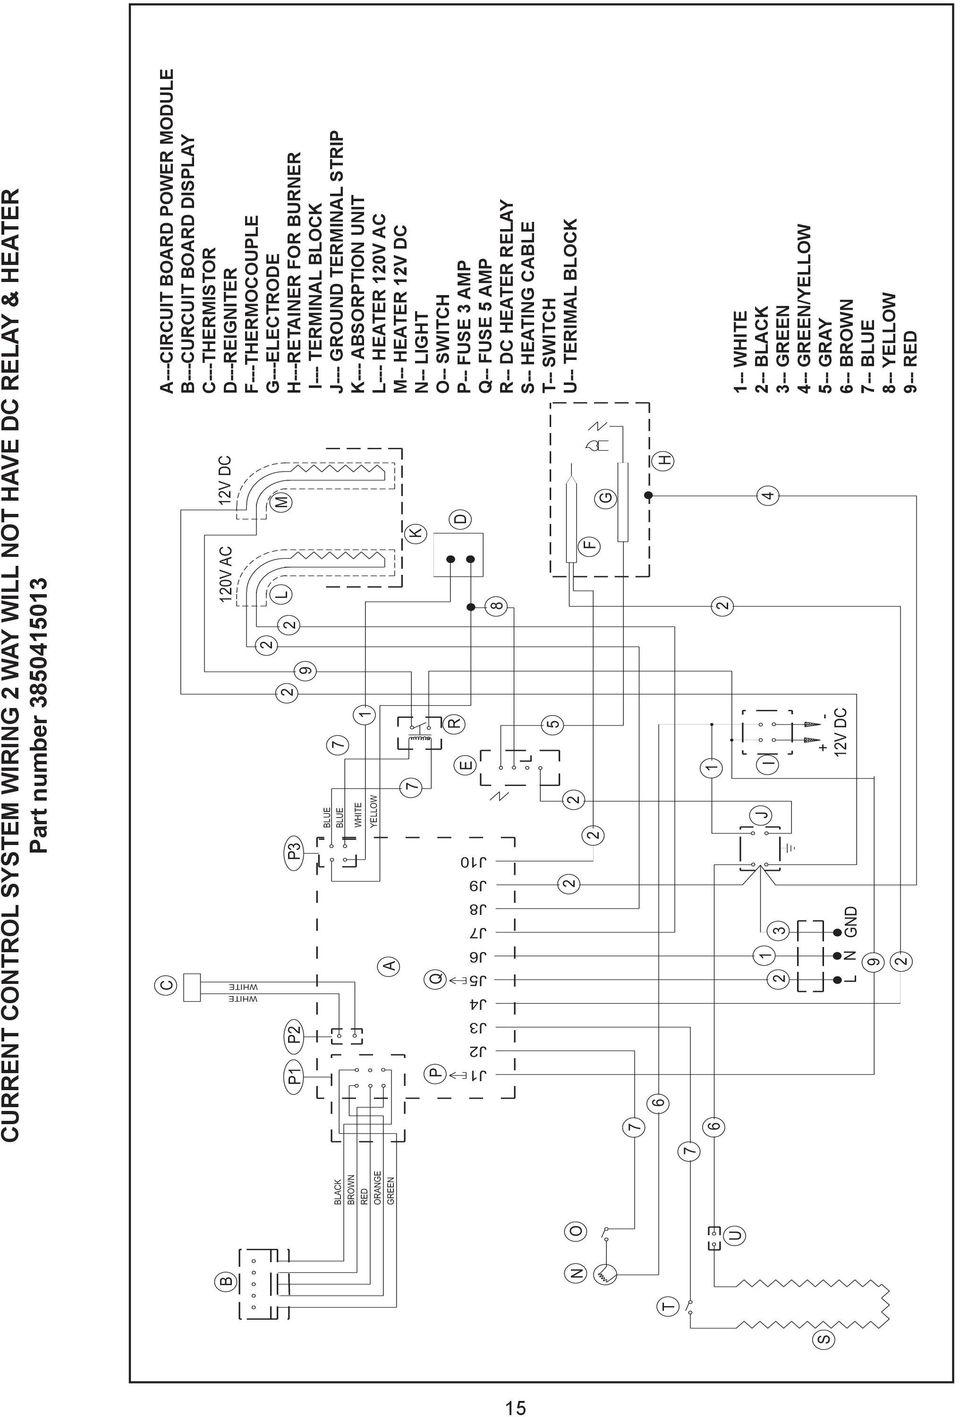 hight resolution of g a circuit a circuit board board power power module module b